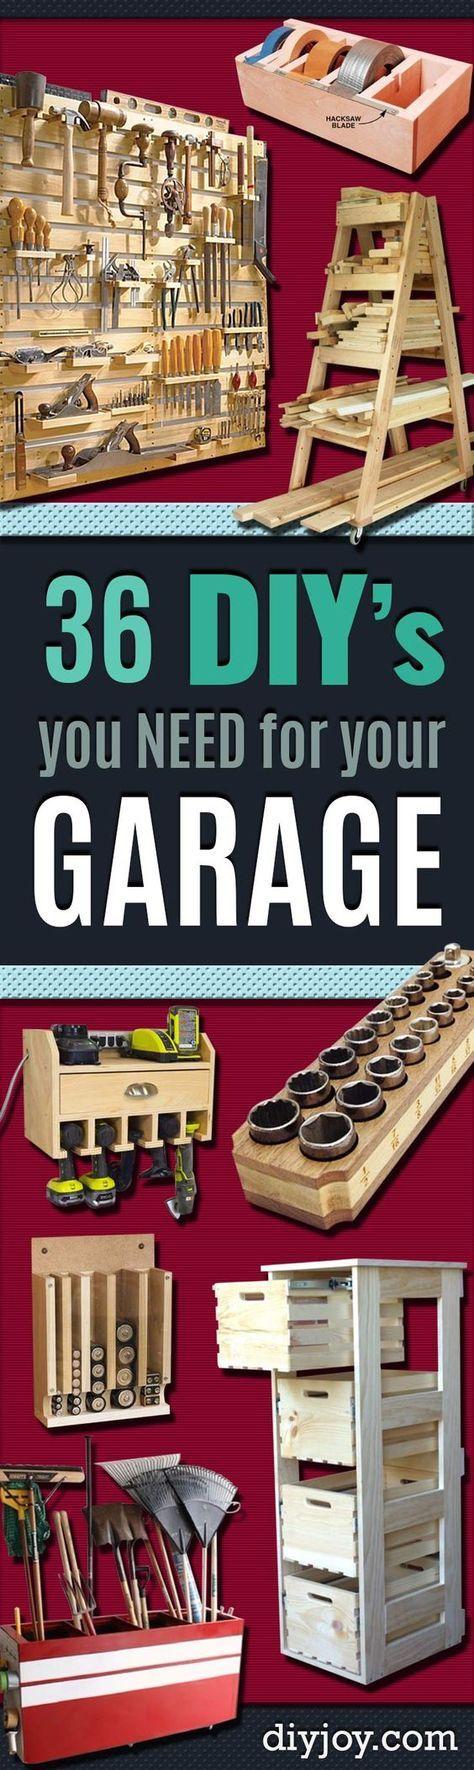 Diy projects your garage needs do it yourself garage makeover ideas diy projects your garage needs do it yourself garage makeover ideas include storage organization solutioingenieria Gallery